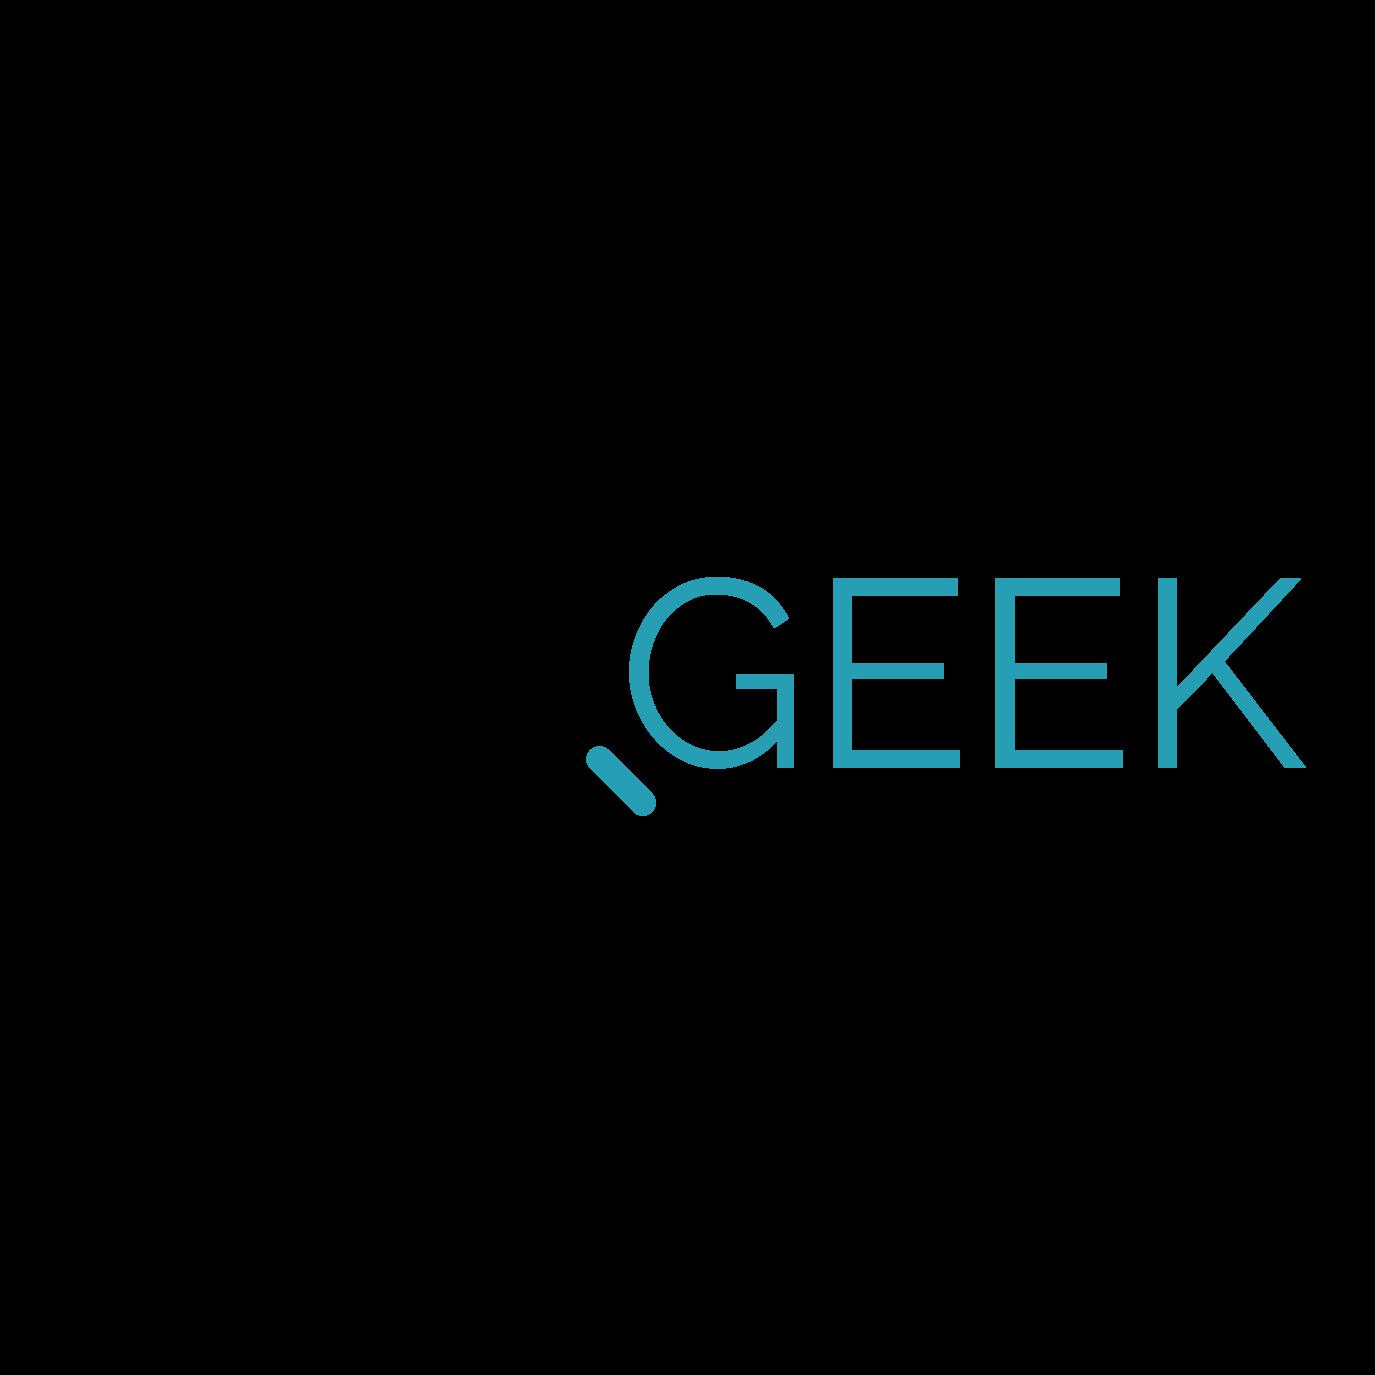 SEOgeek logo